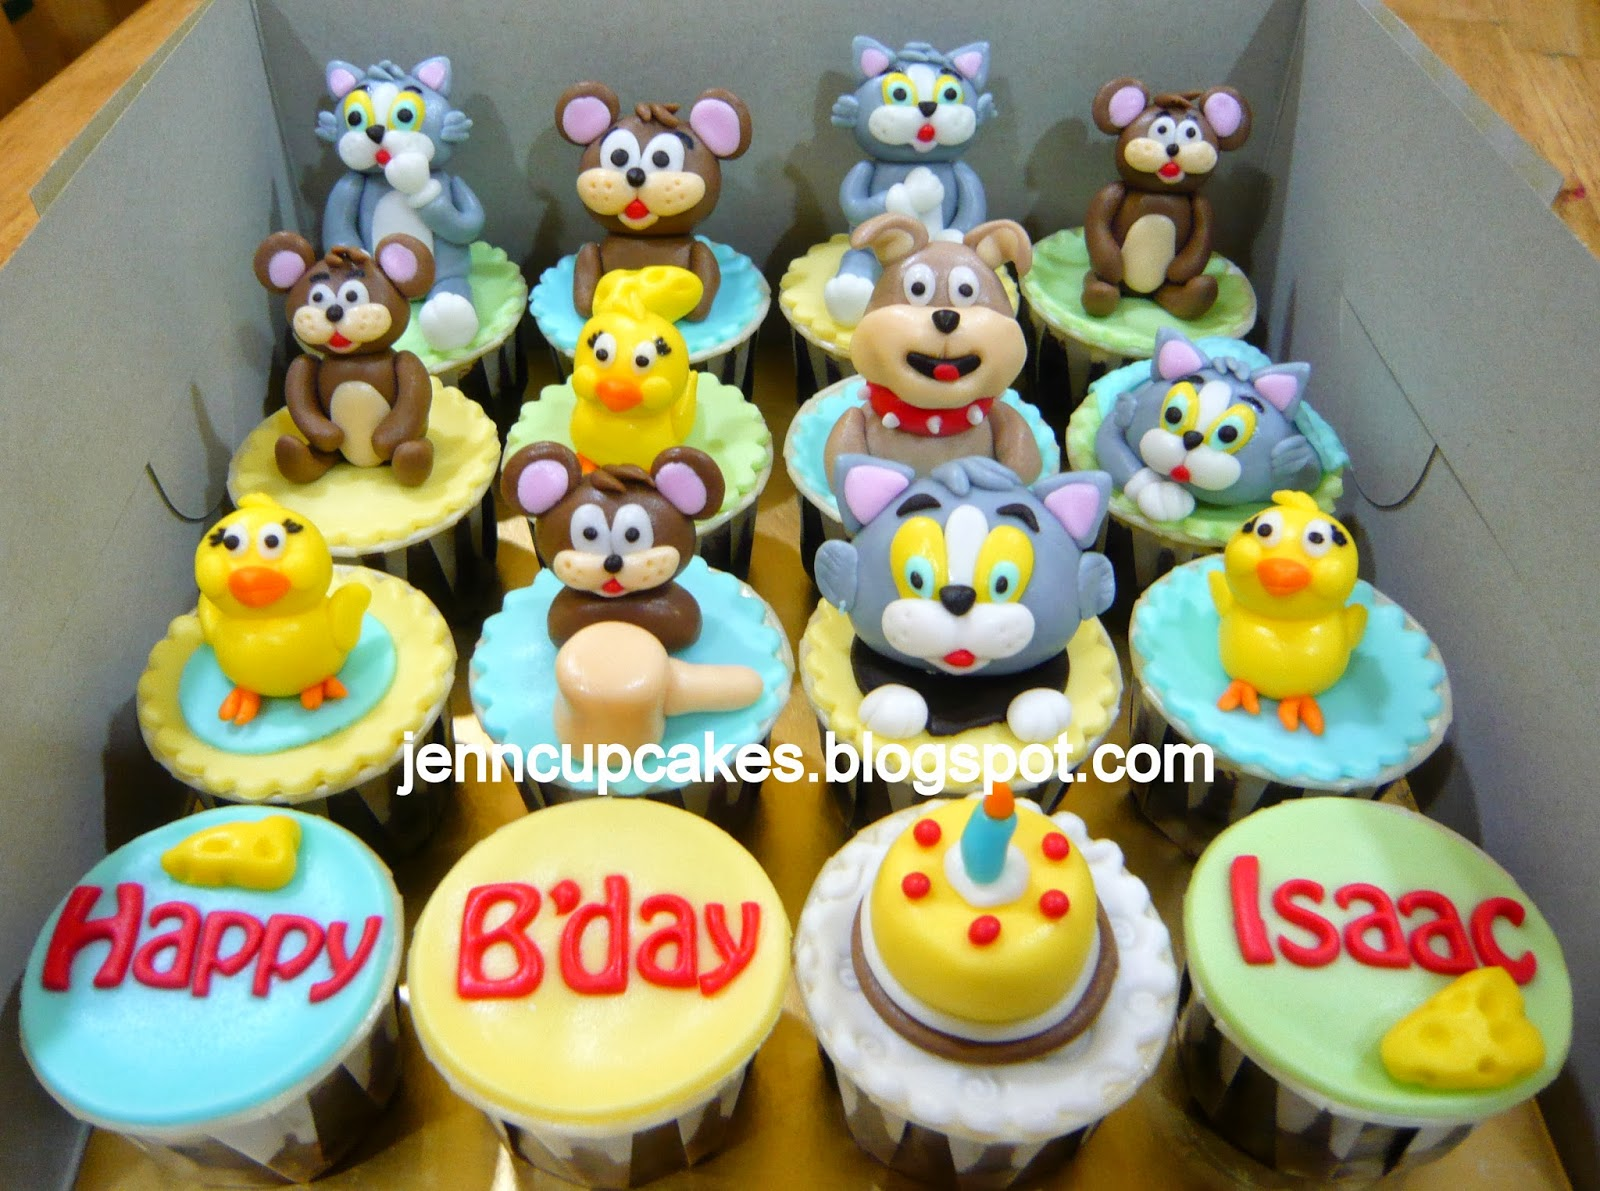 Jenn Cupcakes Muffins Tom Jerry Cupcakes